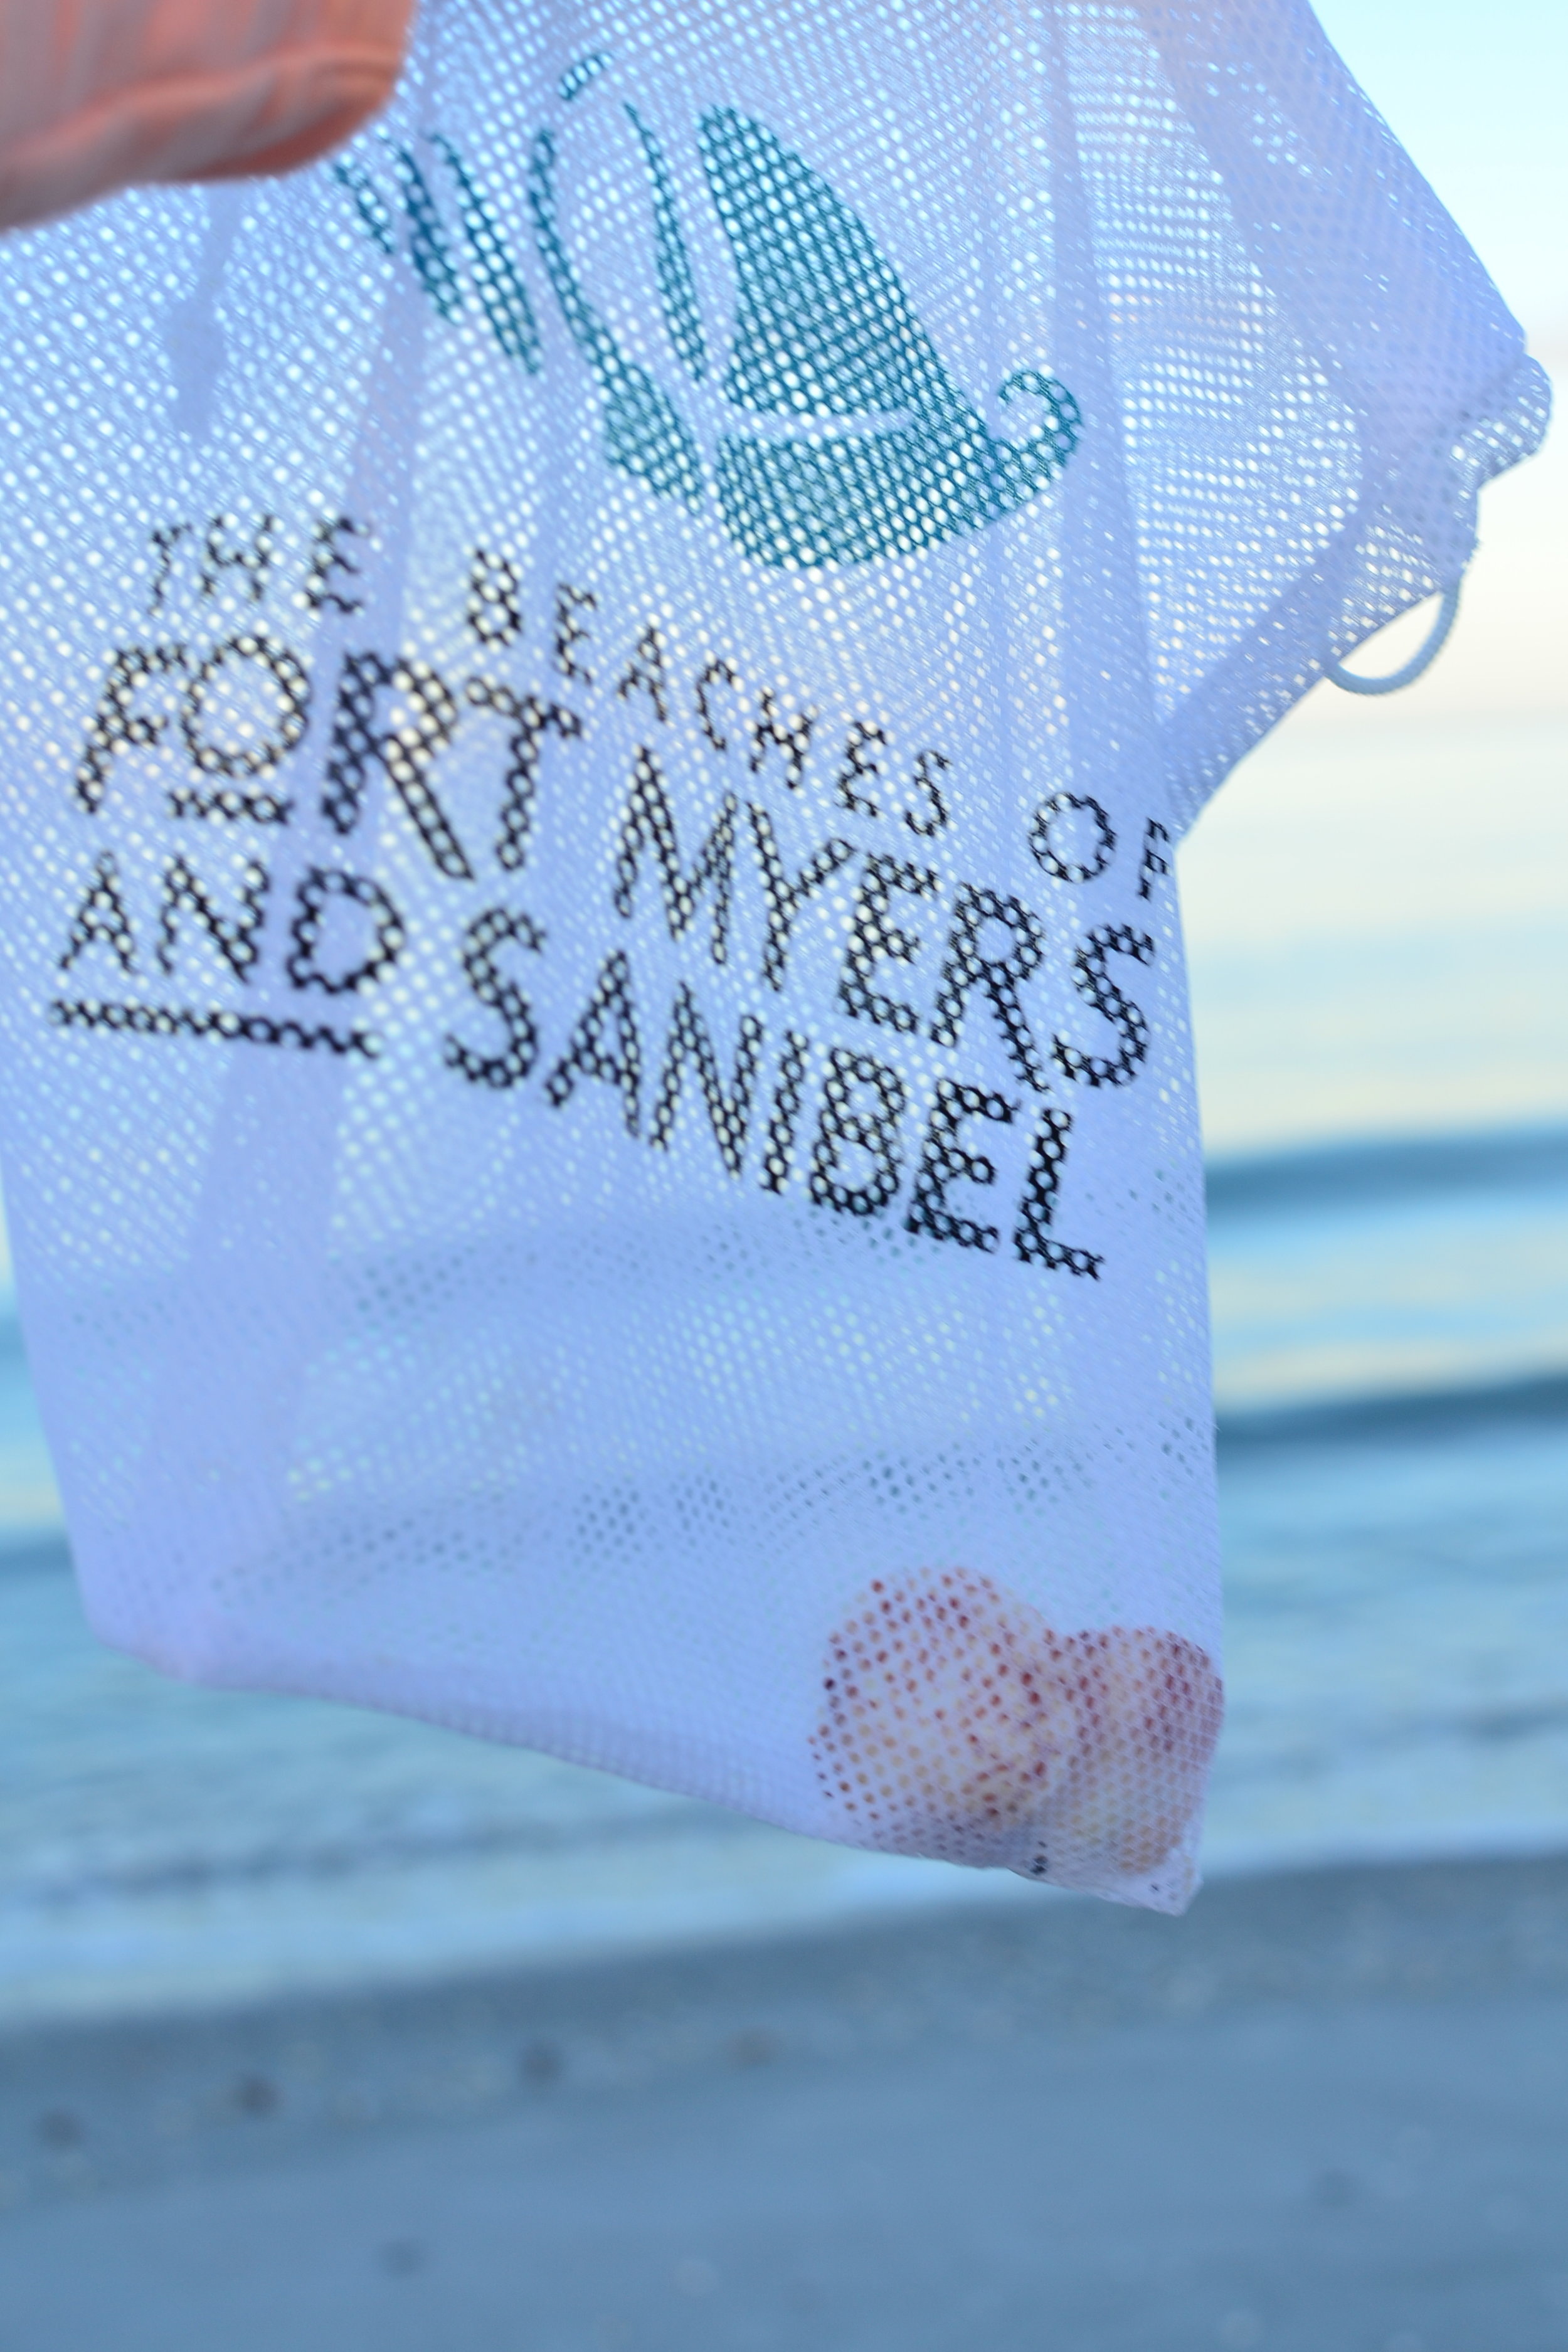 Mesh Bag for collection seashells in Sanibel and Captiva Island